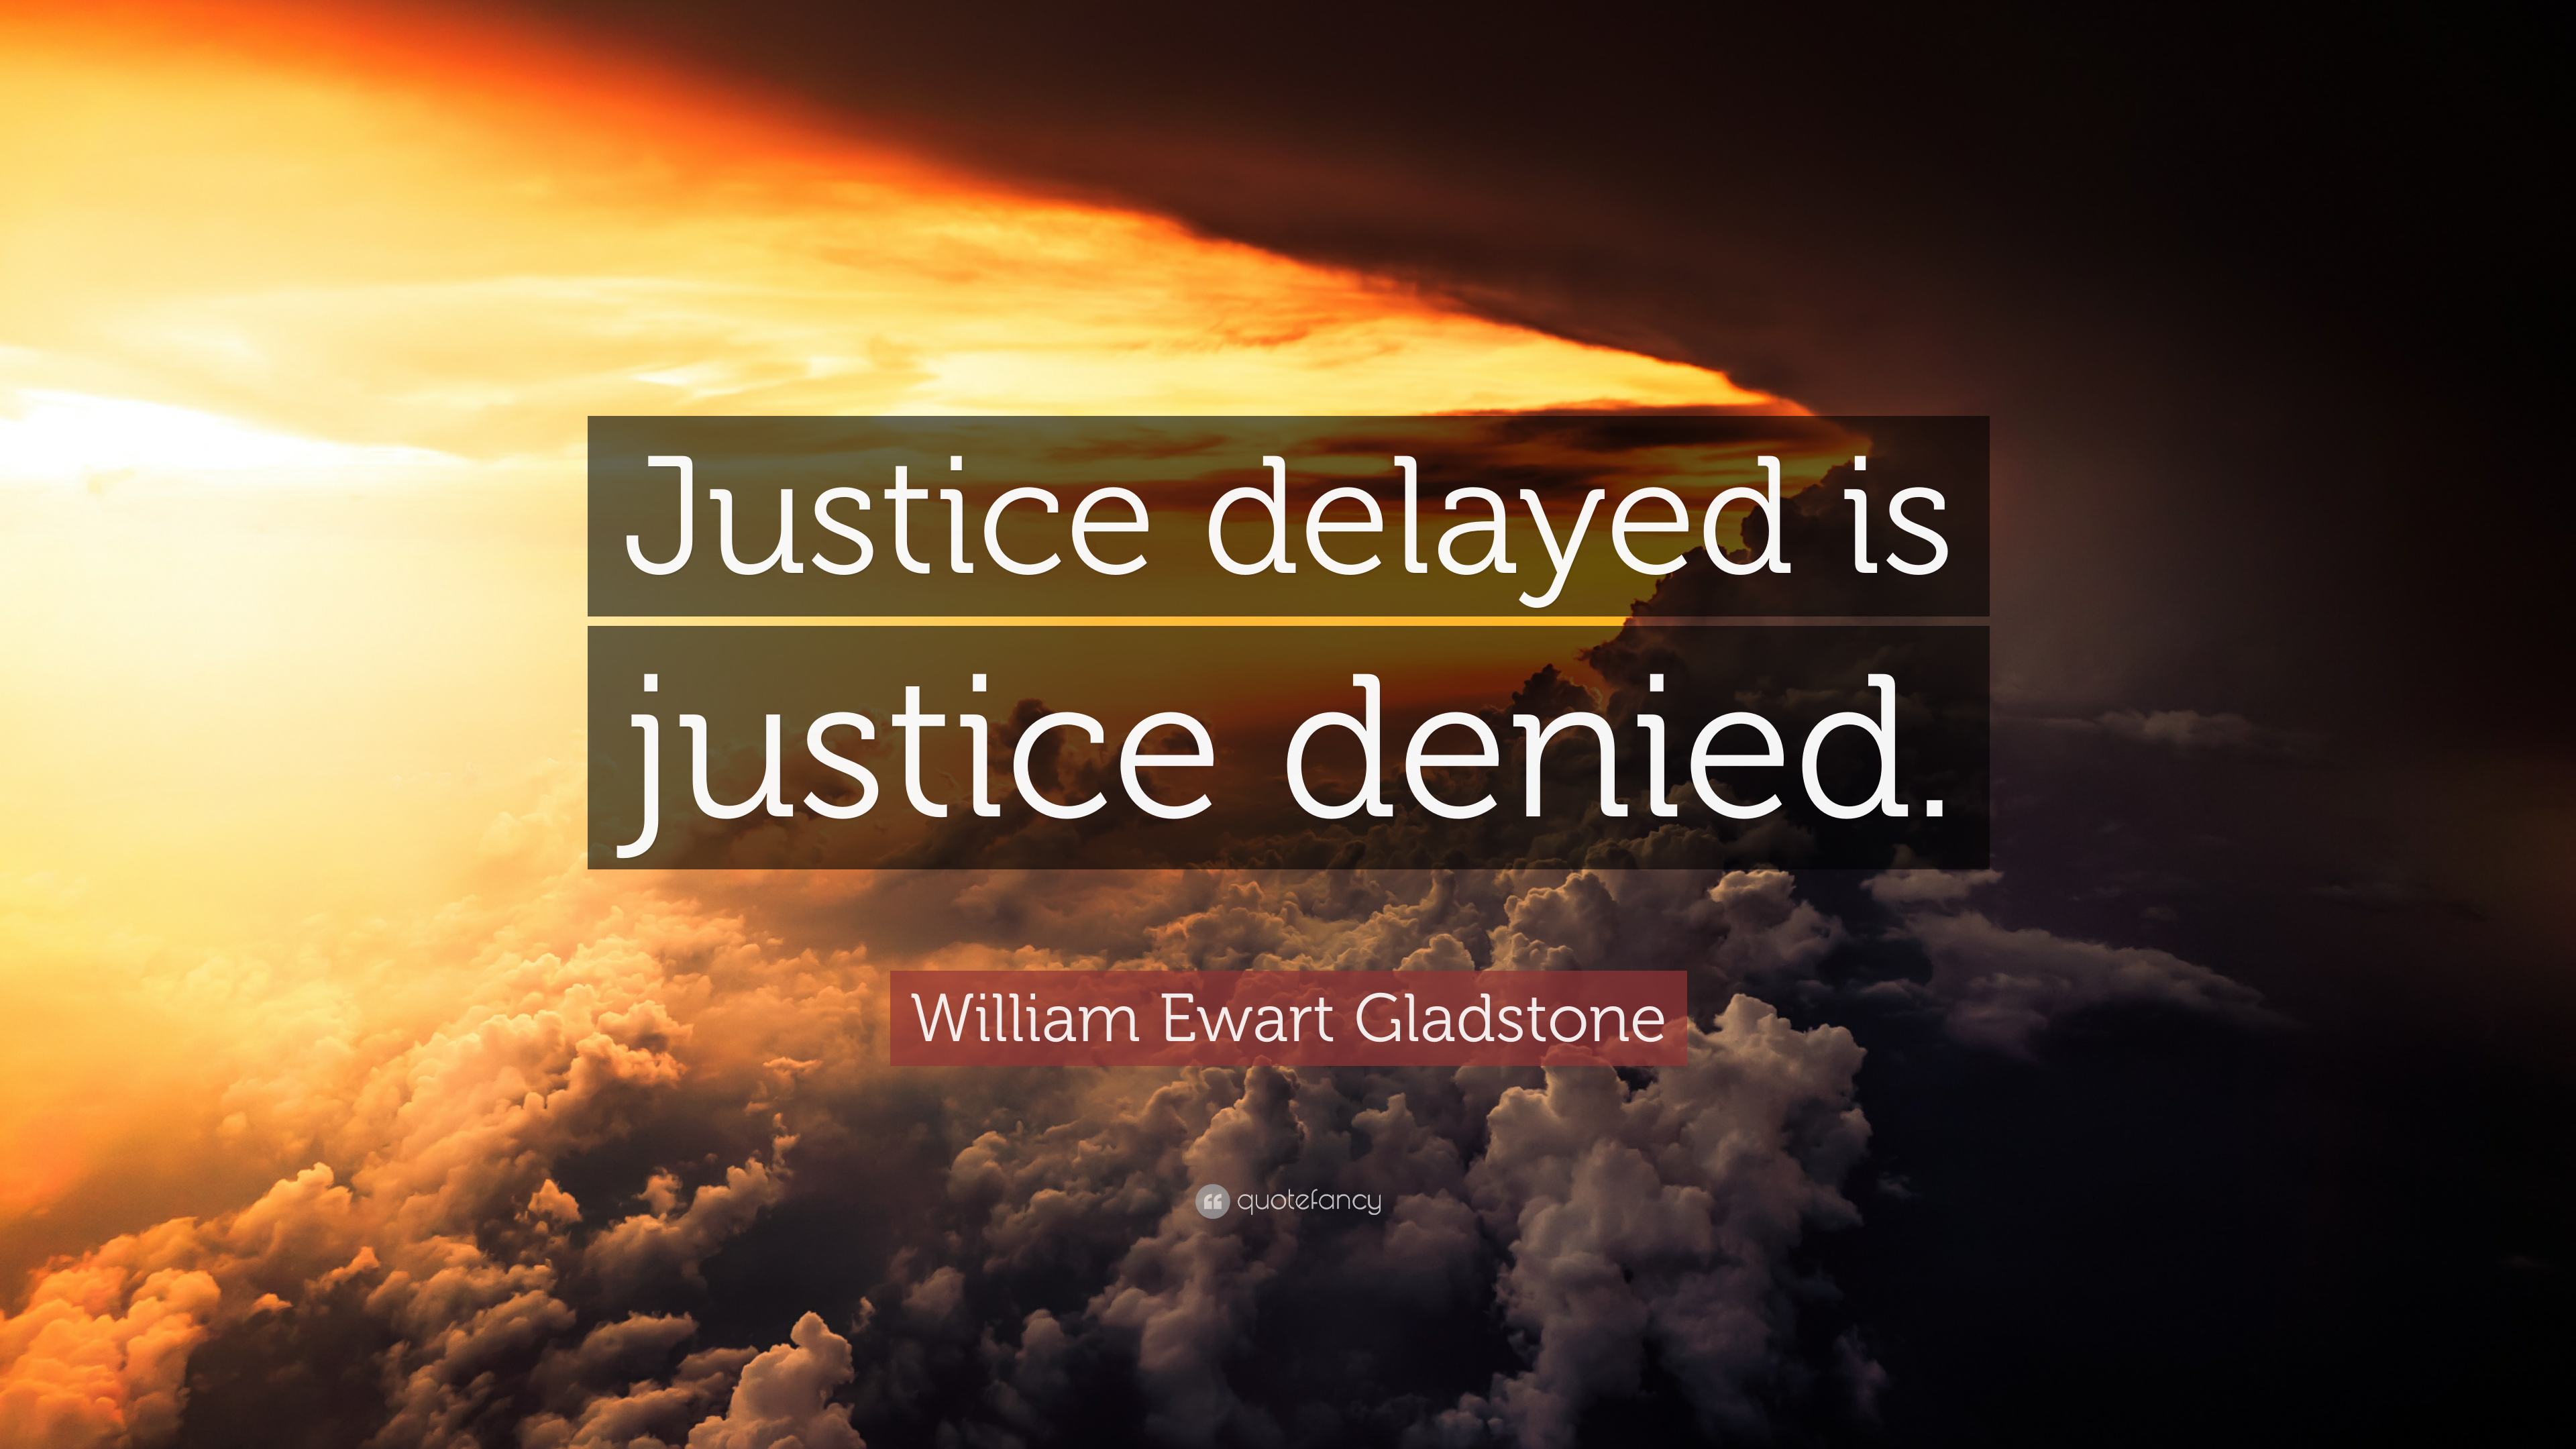 William ewart gladstone quote justice delayed is justice denied william ewart gladstone quote justice delayed is justice denied sciox Choice Image